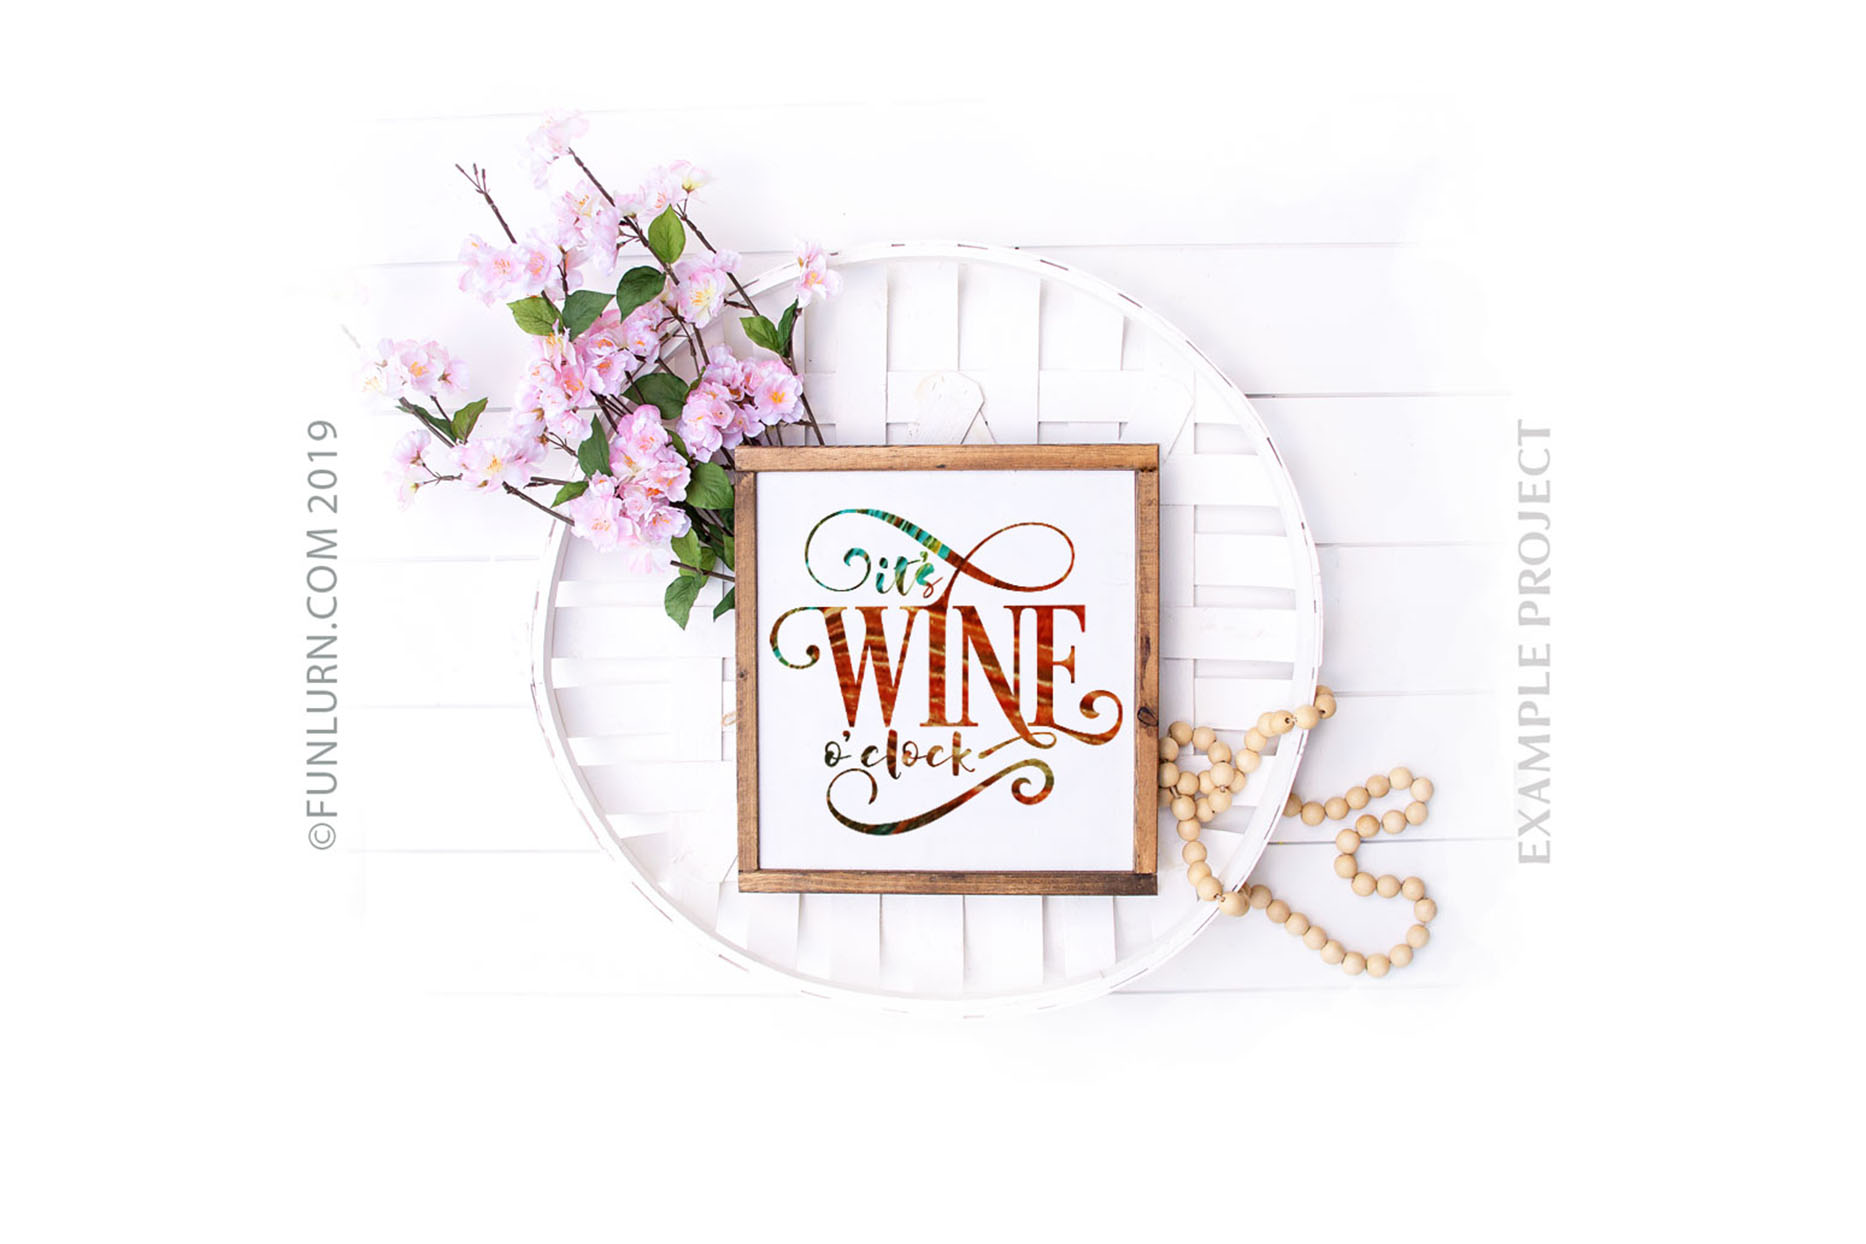 It's Wine O'clock SVG Cut File example image 3